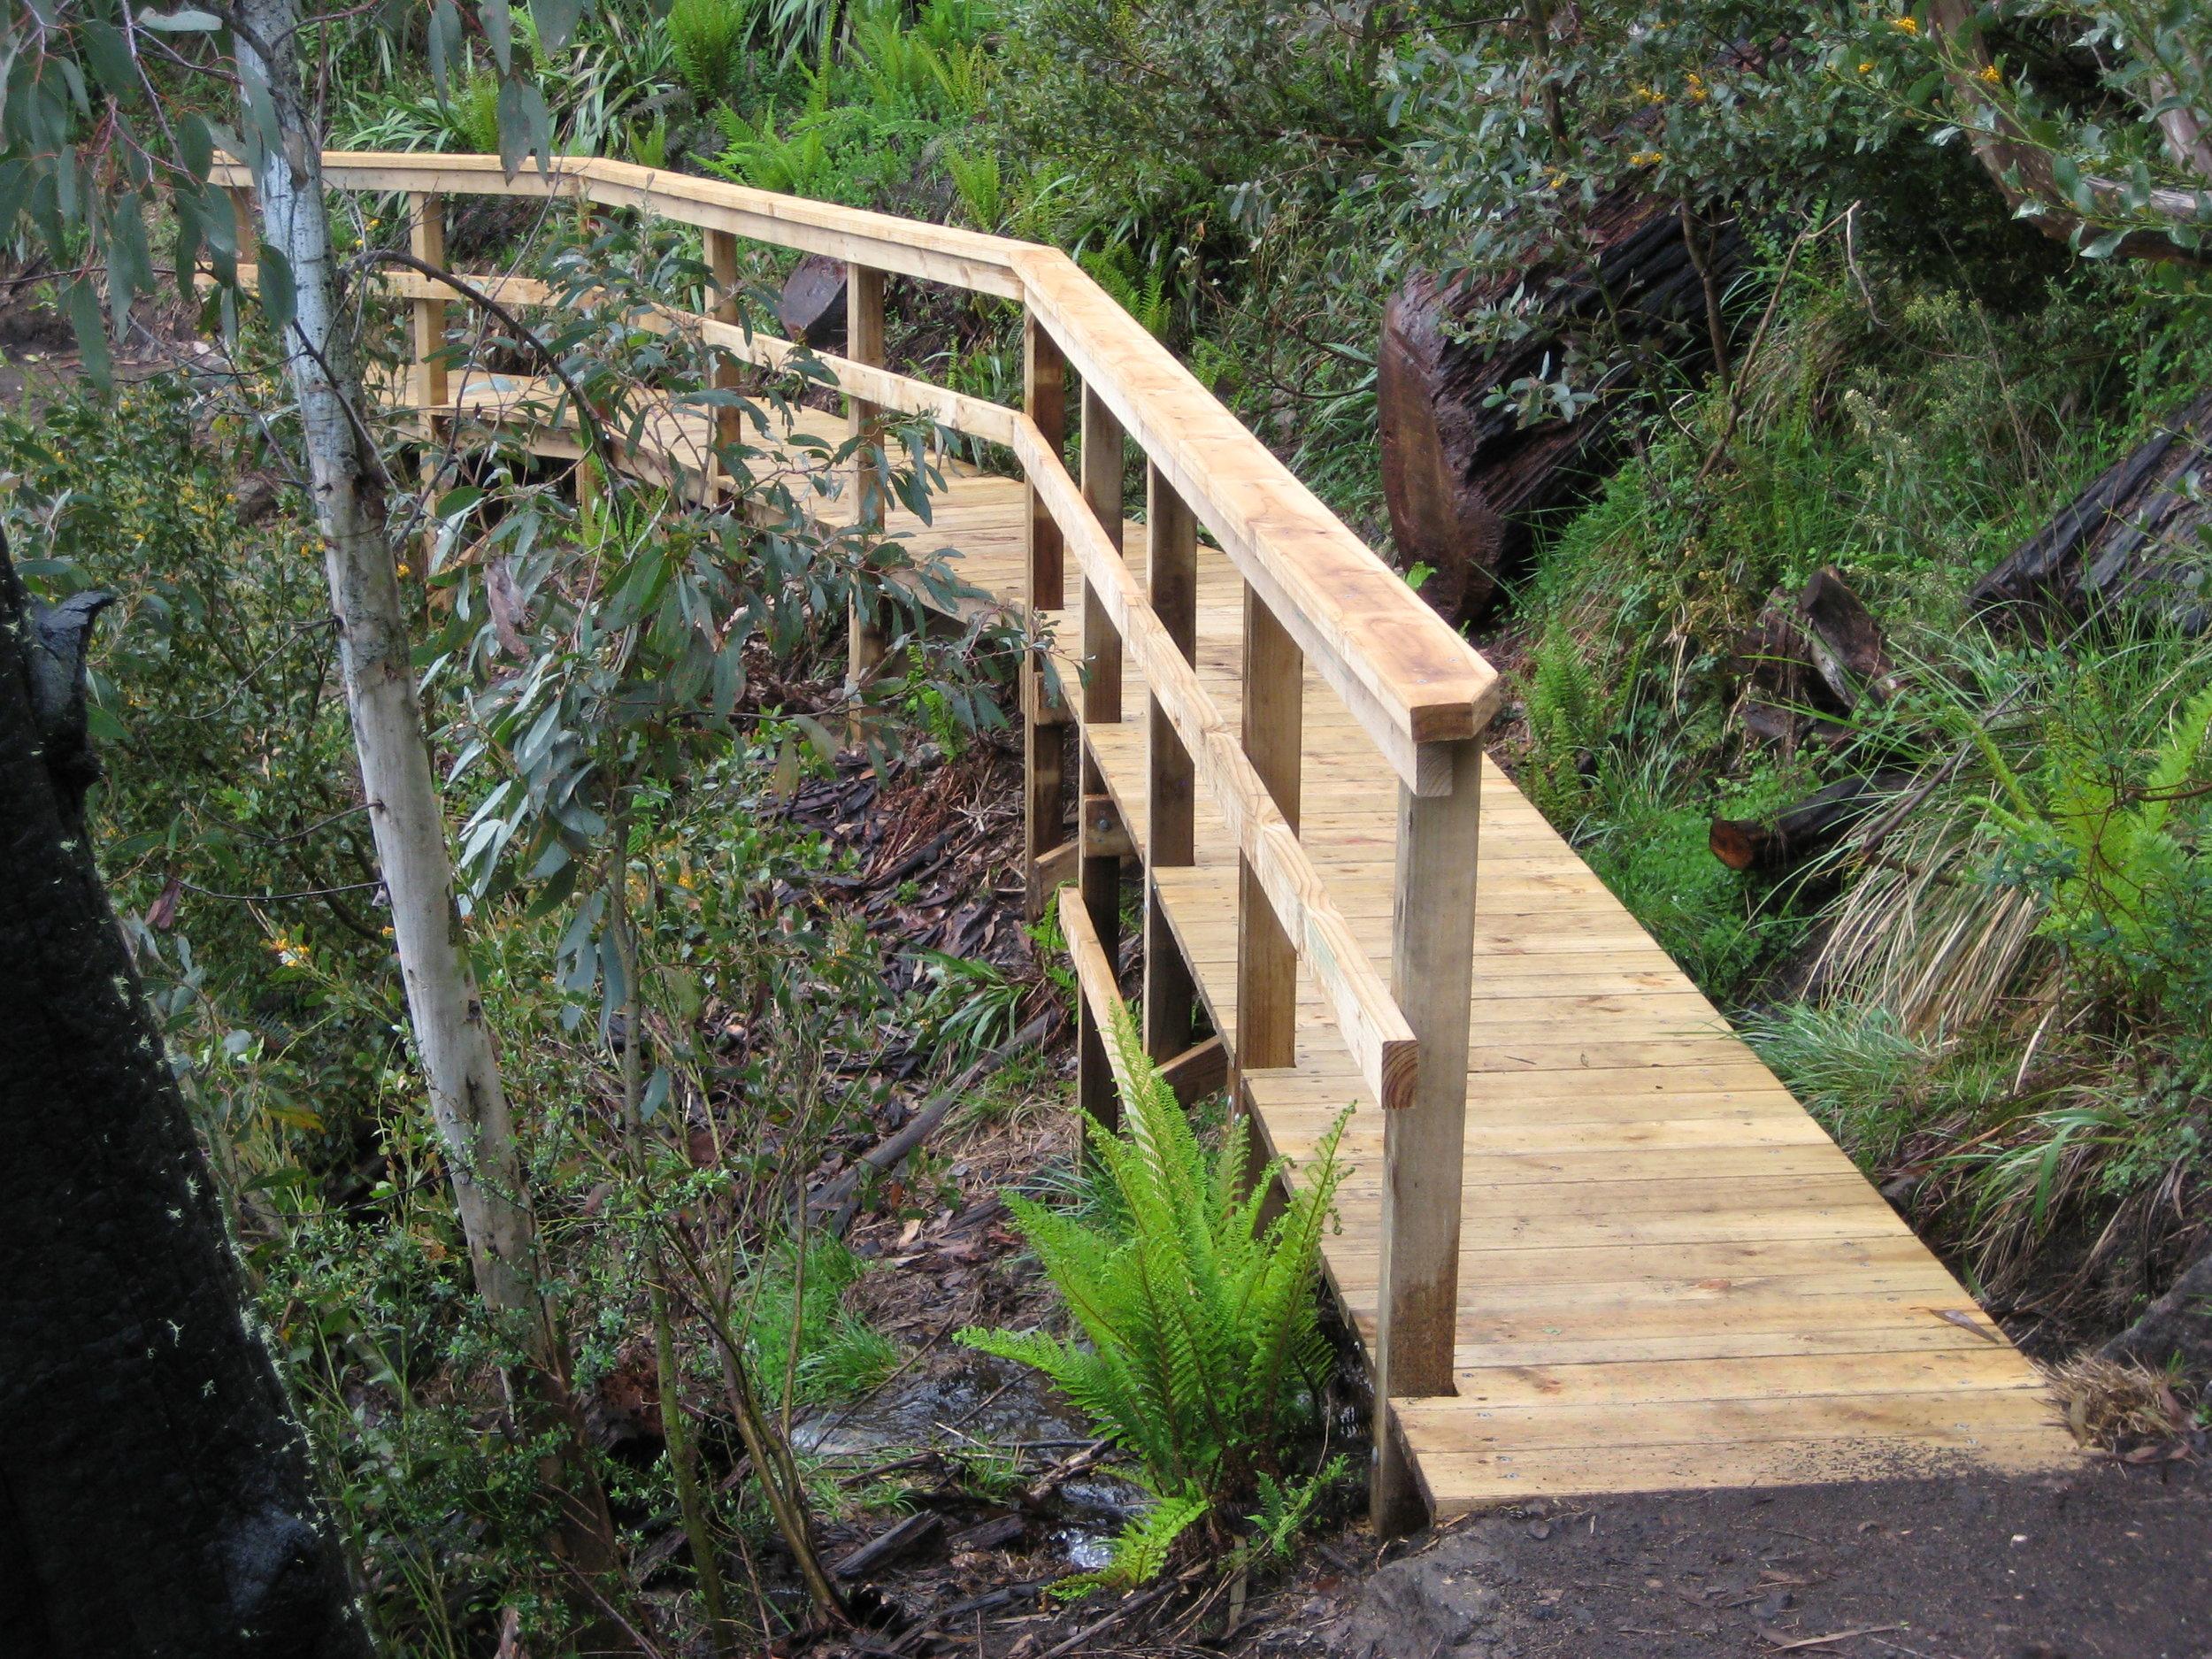 PH_Boardwalk_with_Handrail.JPG